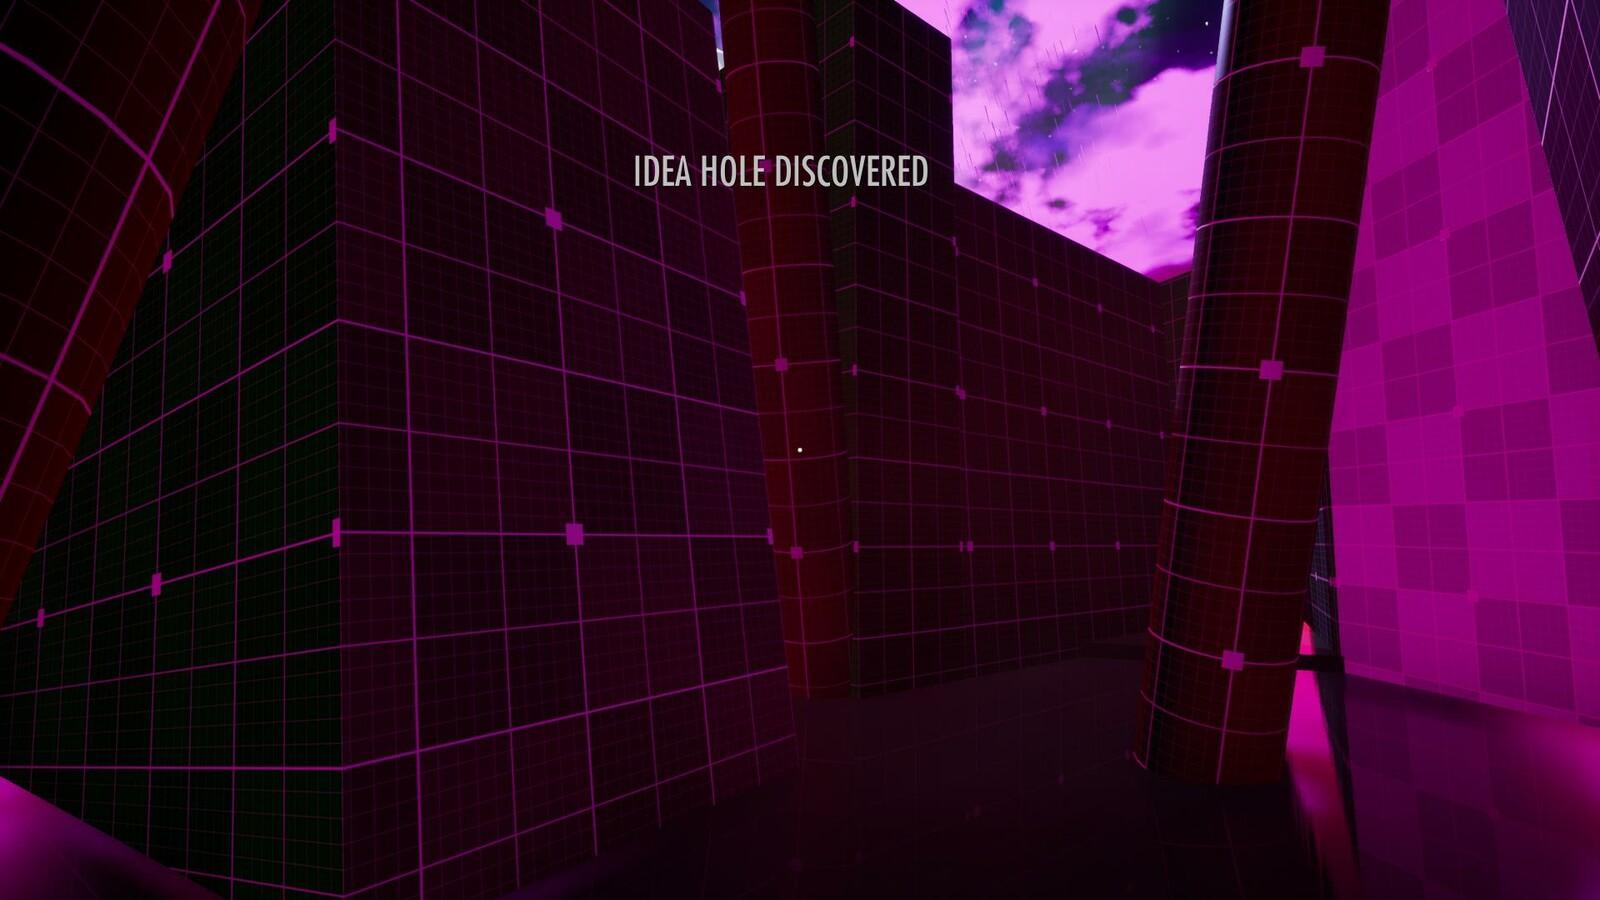 The Beginning of the Idea Hole area.